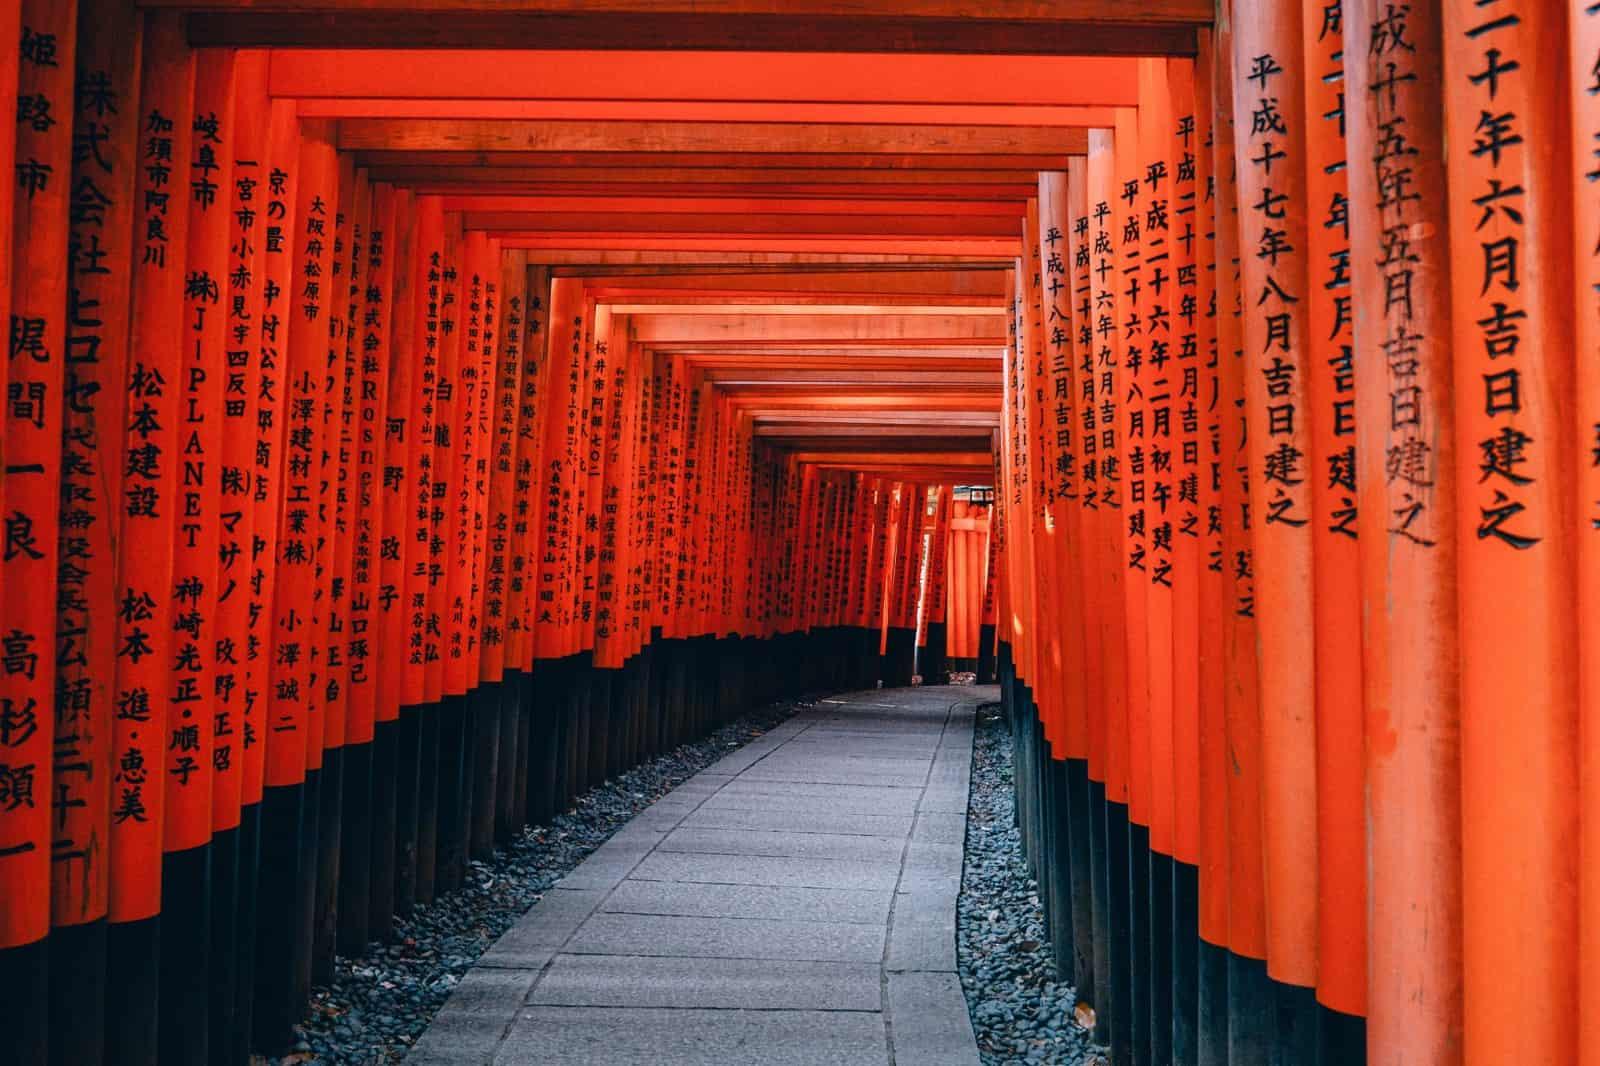 visit the Fushimi Inari Shrine